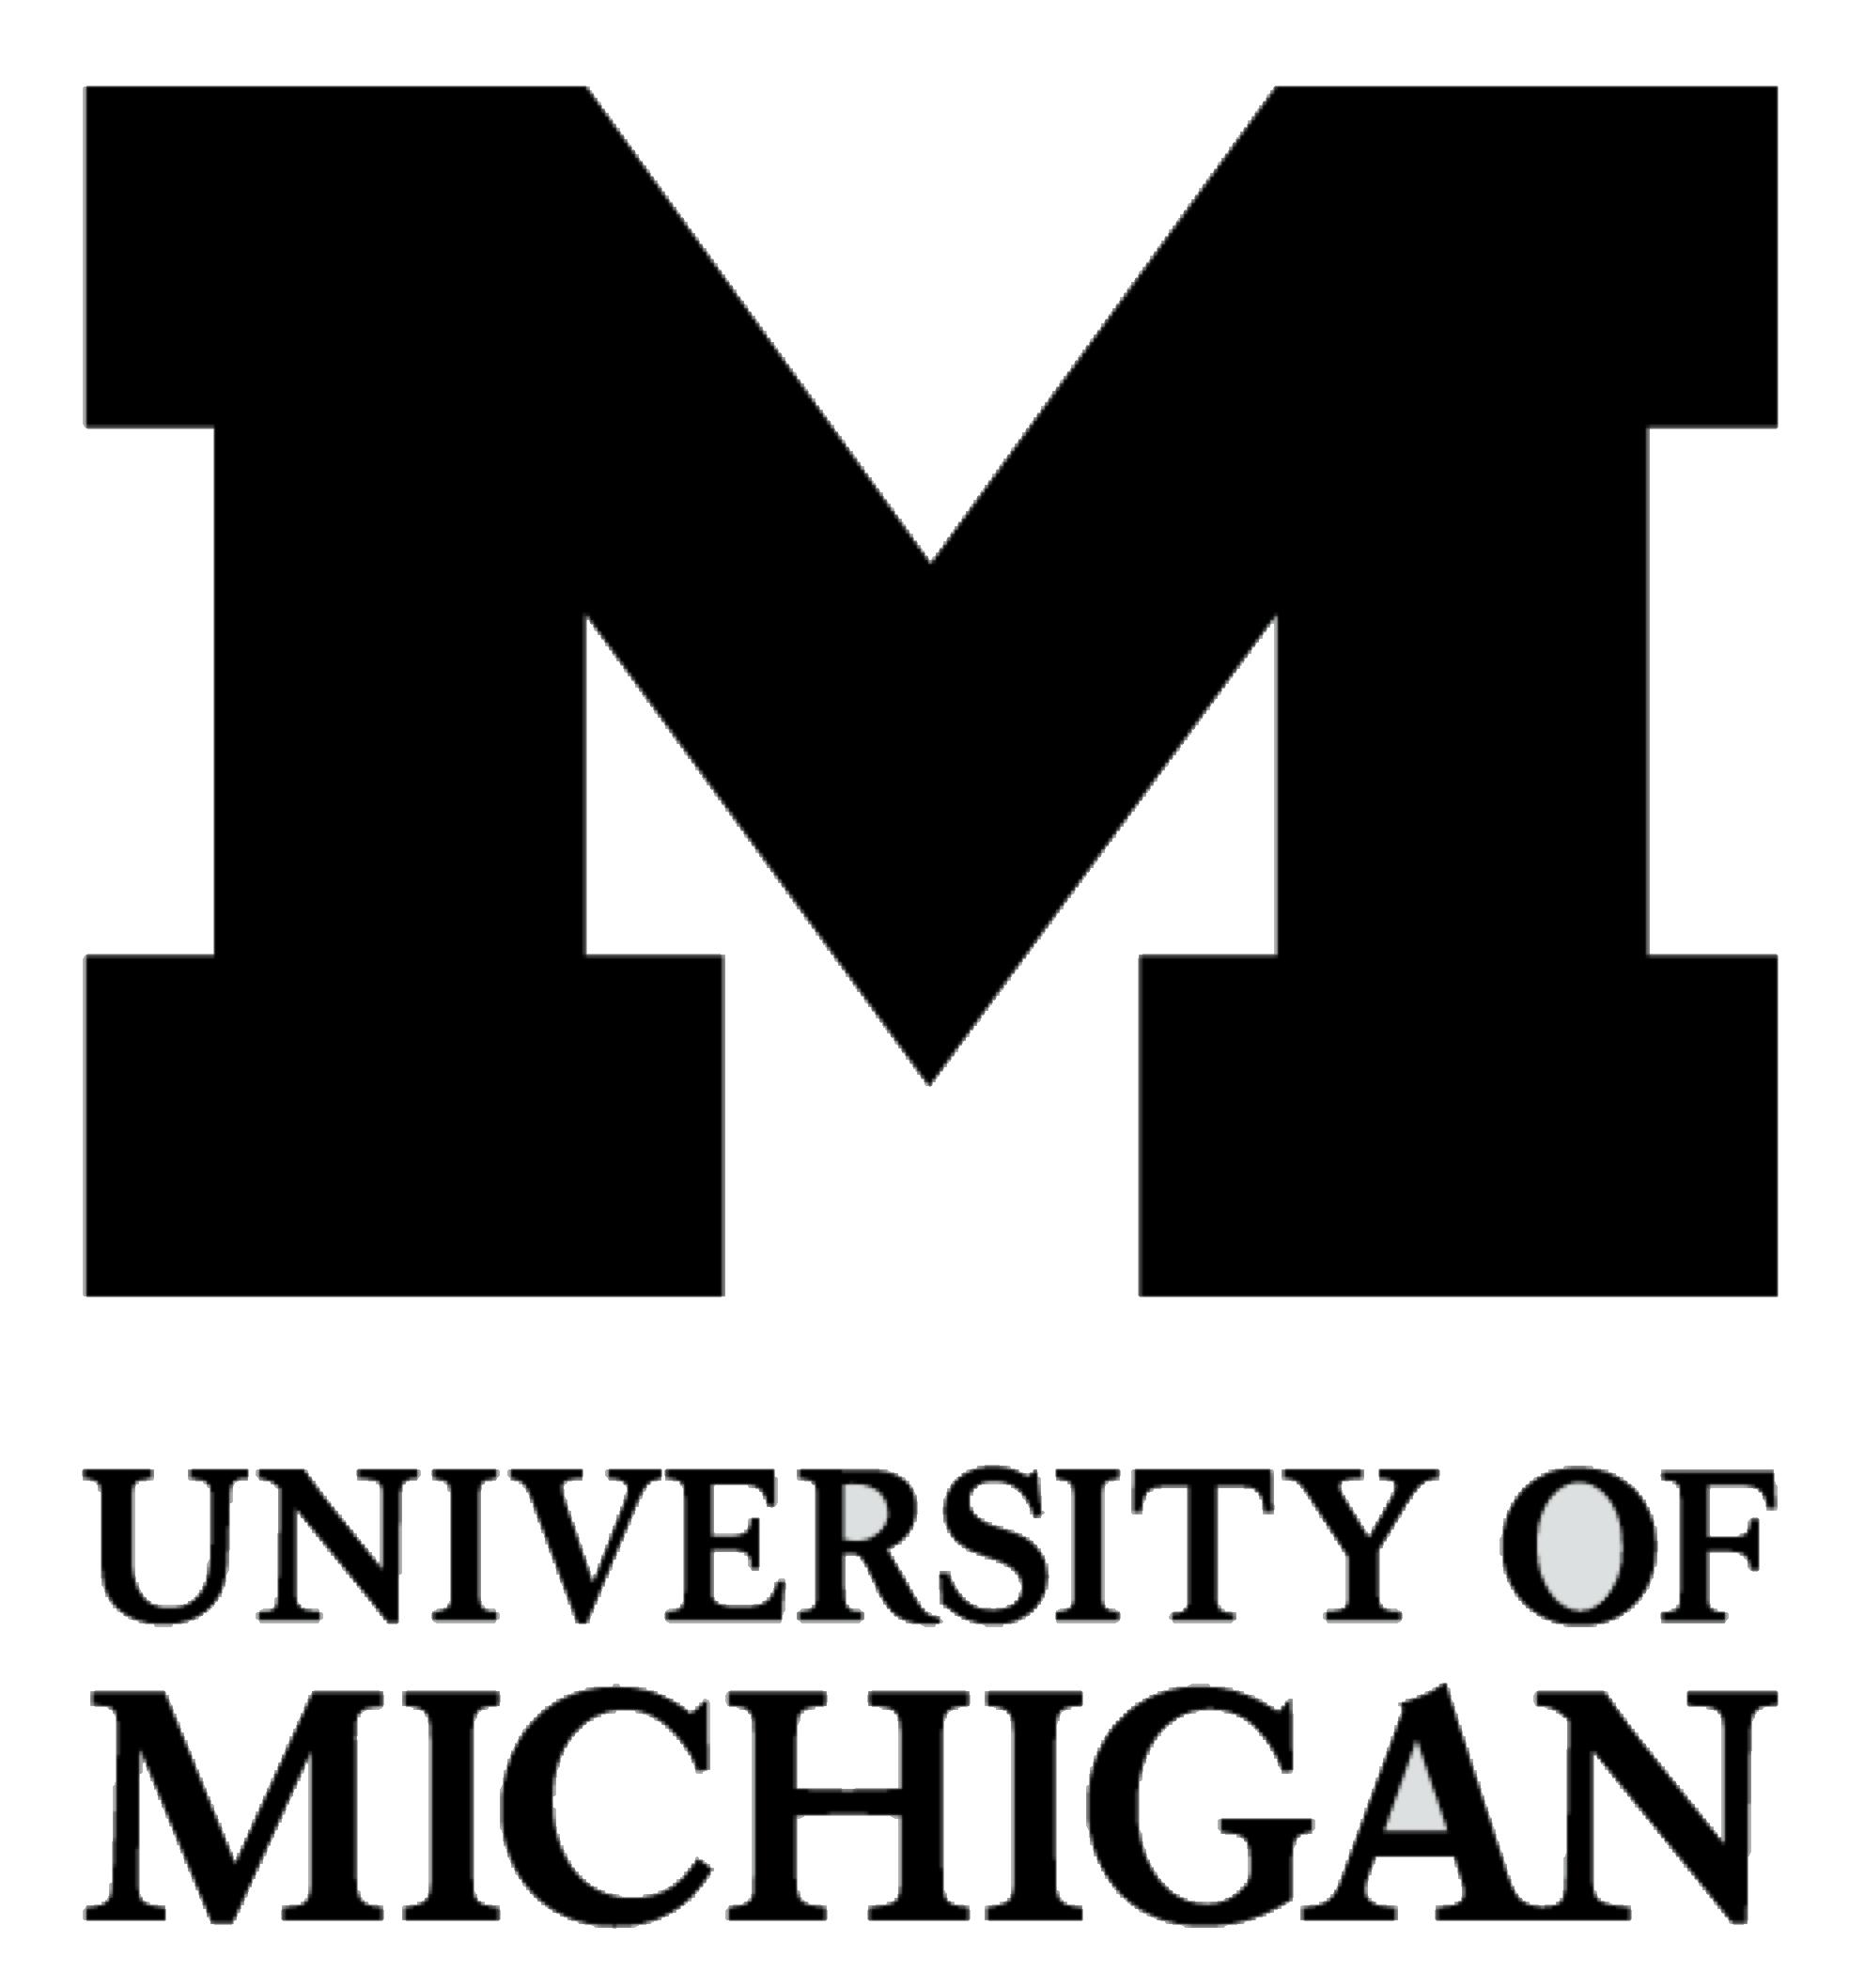 Block M and University of Michigan logo